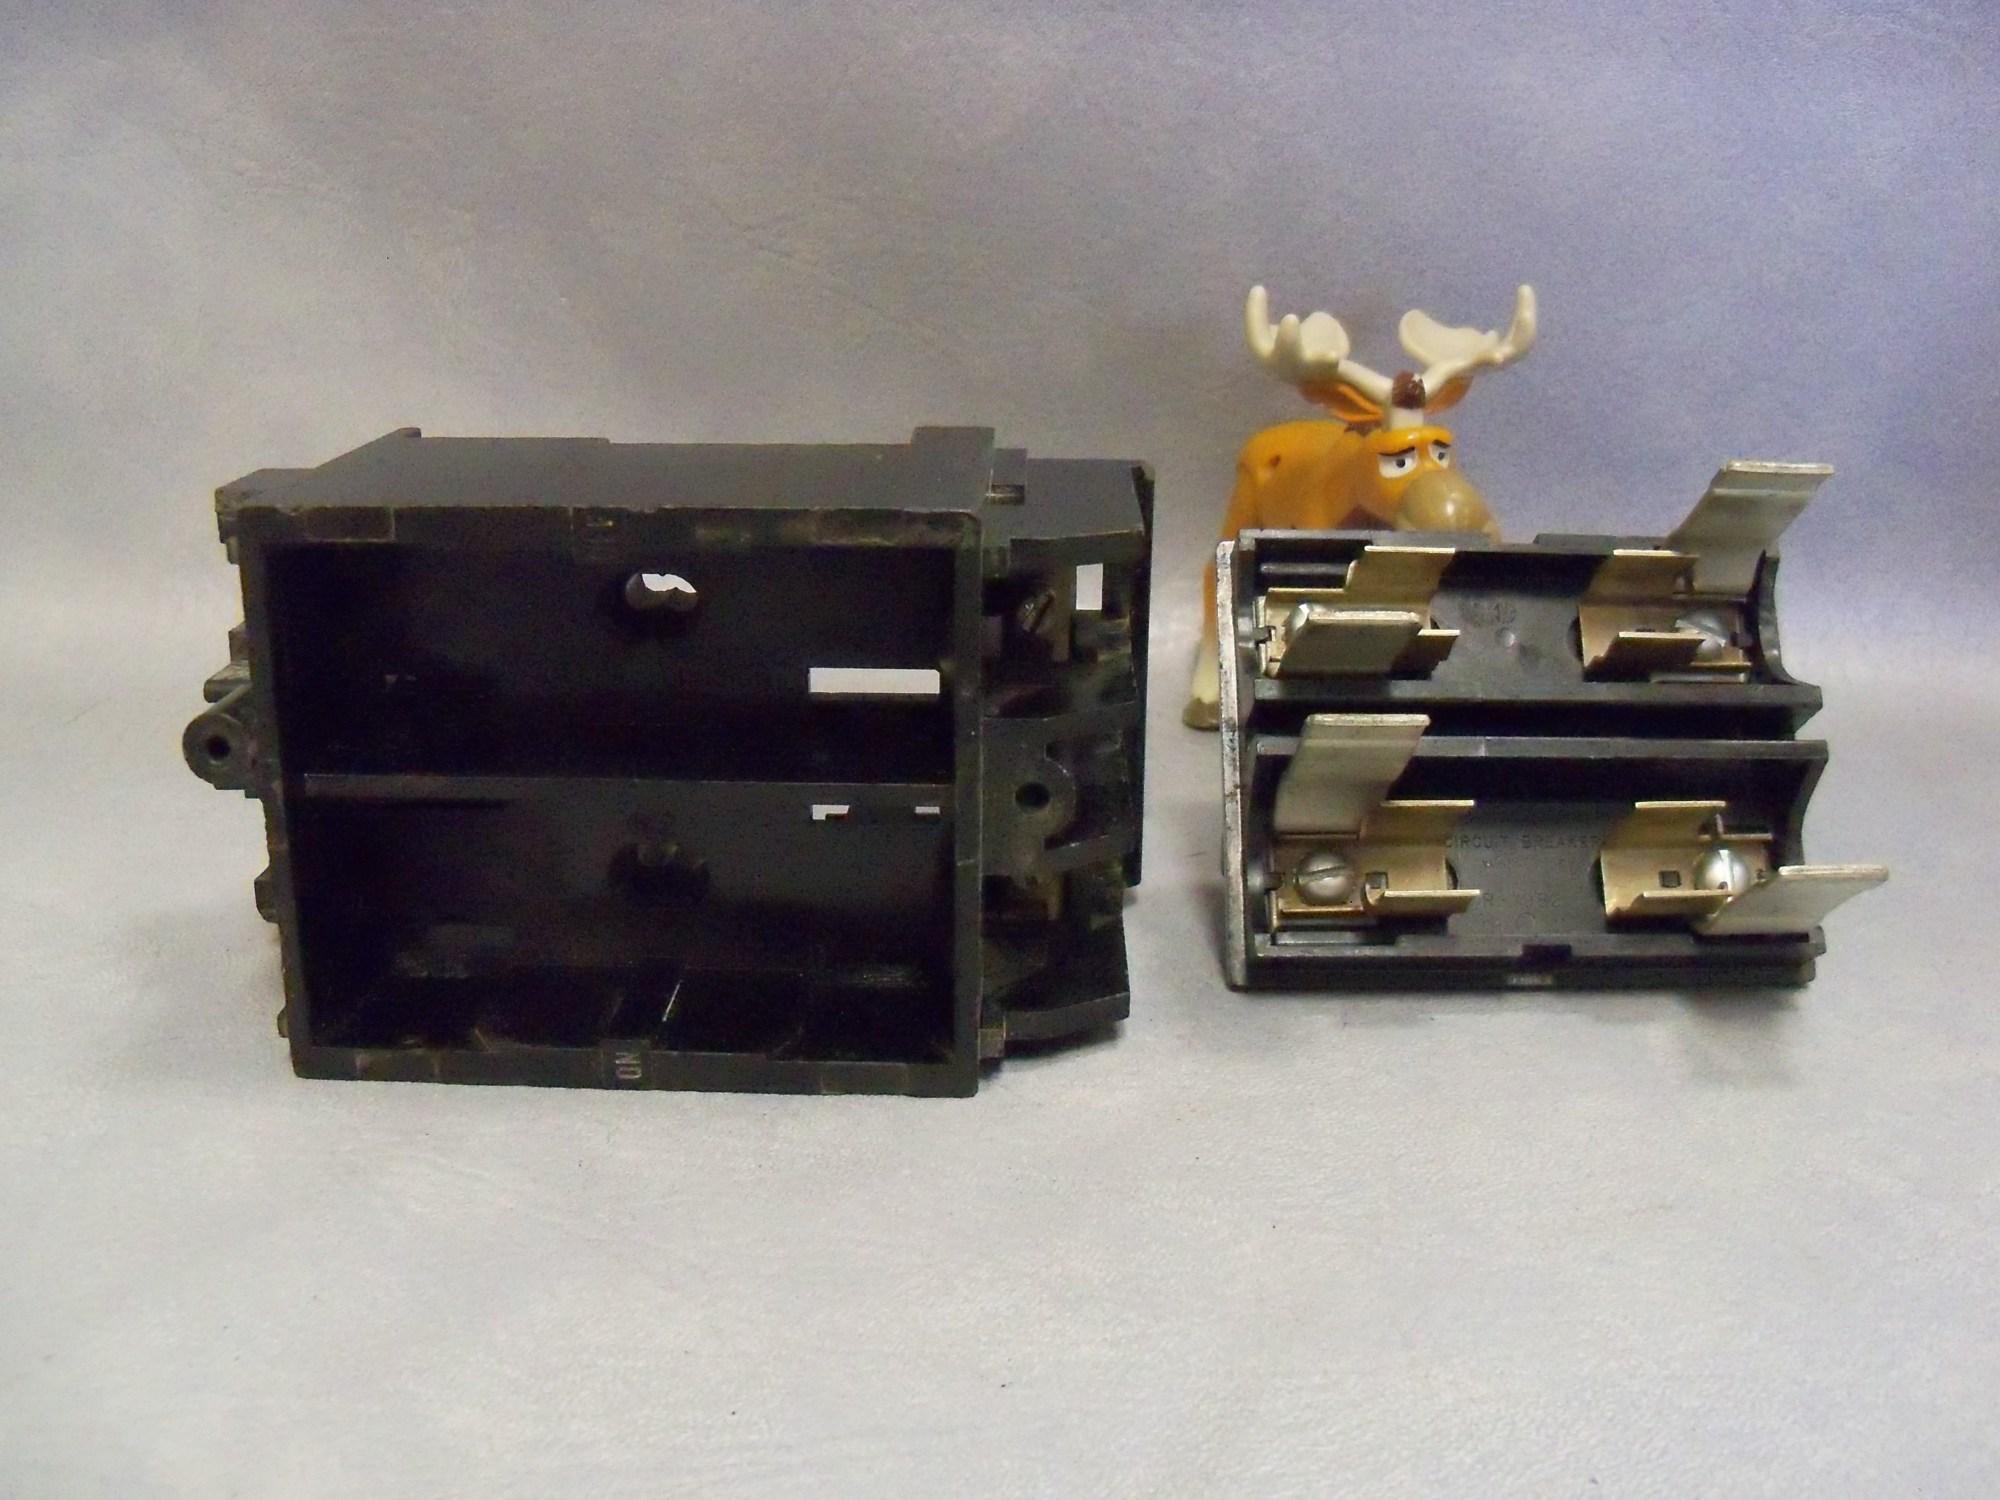 hight resolution of 30 amp fuse block r 1982 1 w r 1982 lid ite walker